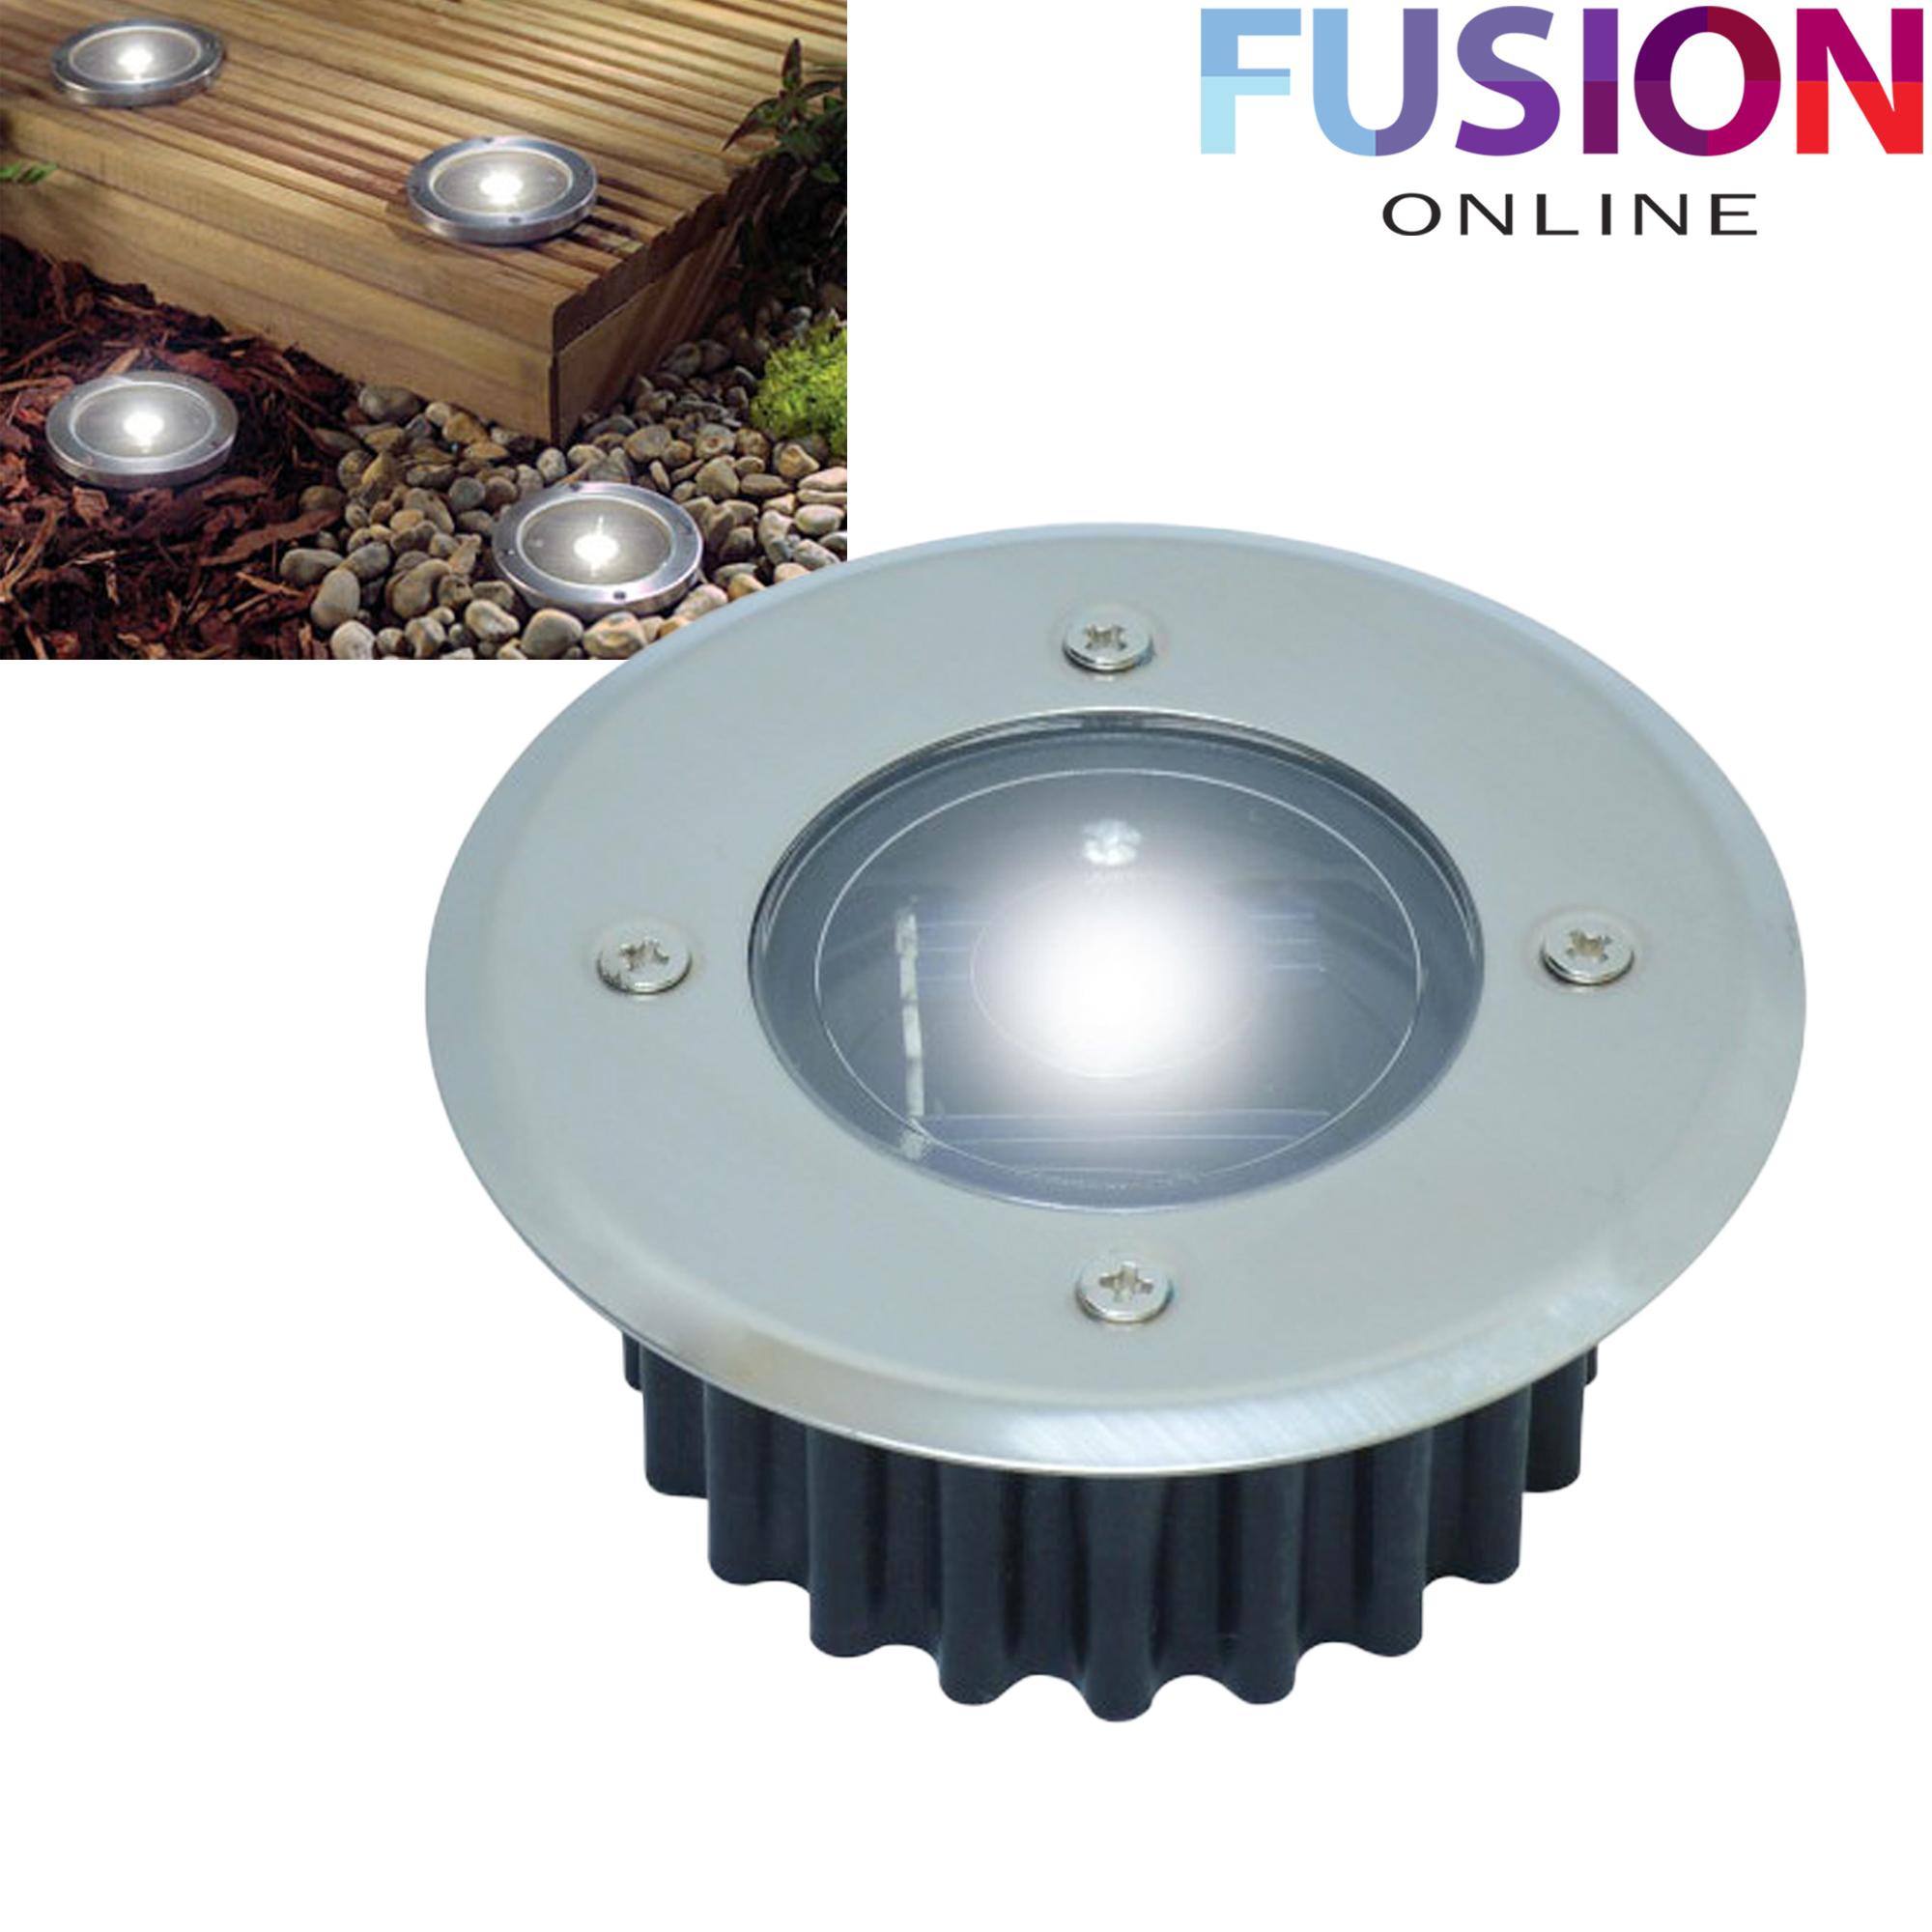 led solar powered deck lights decking garden driveway outdoor wireless lighting ebay. Black Bedroom Furniture Sets. Home Design Ideas